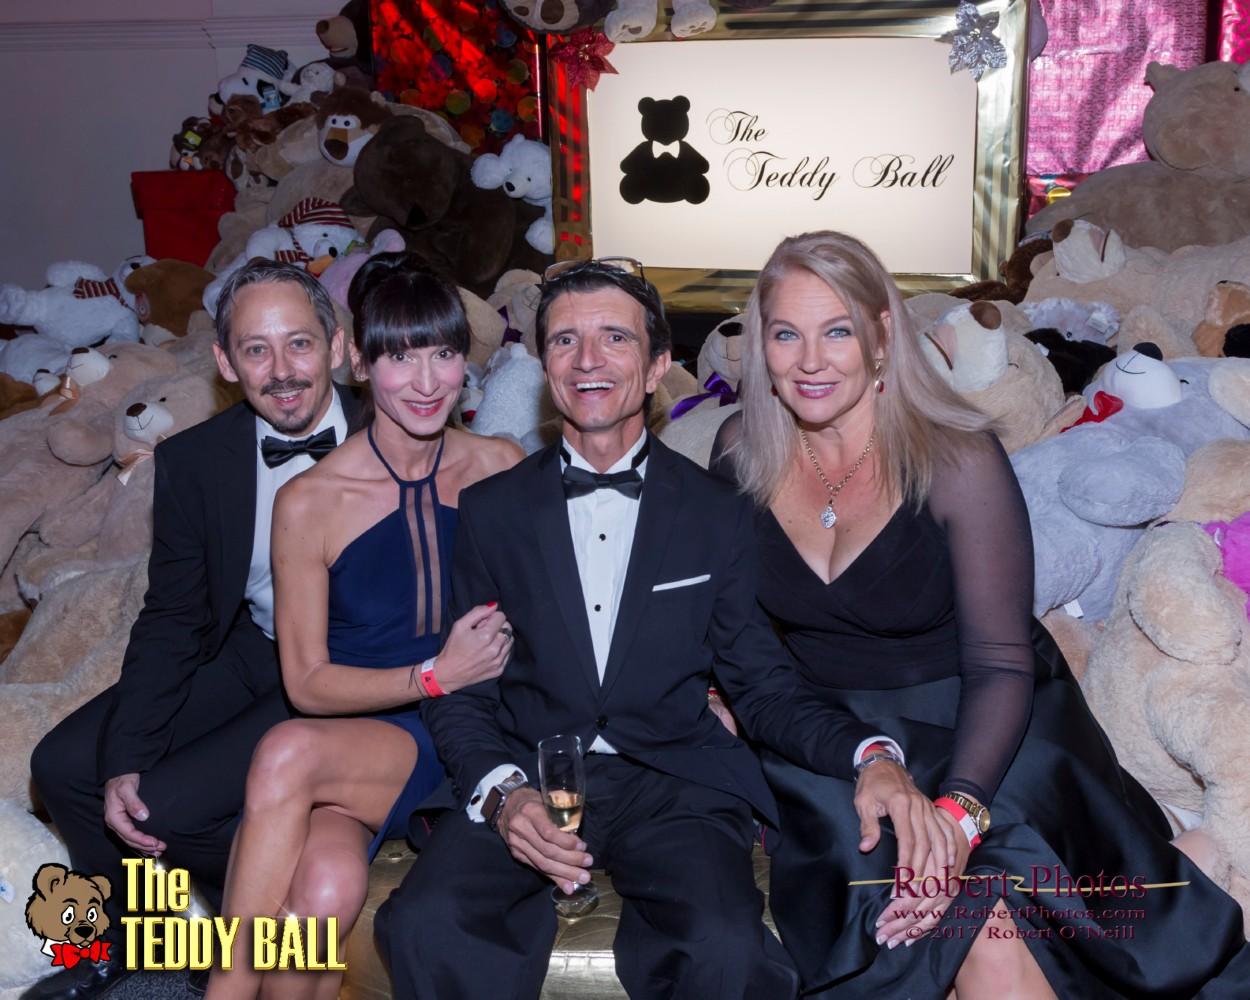 Teddy-Ball-2017-Robert-Photos- 54.jpg